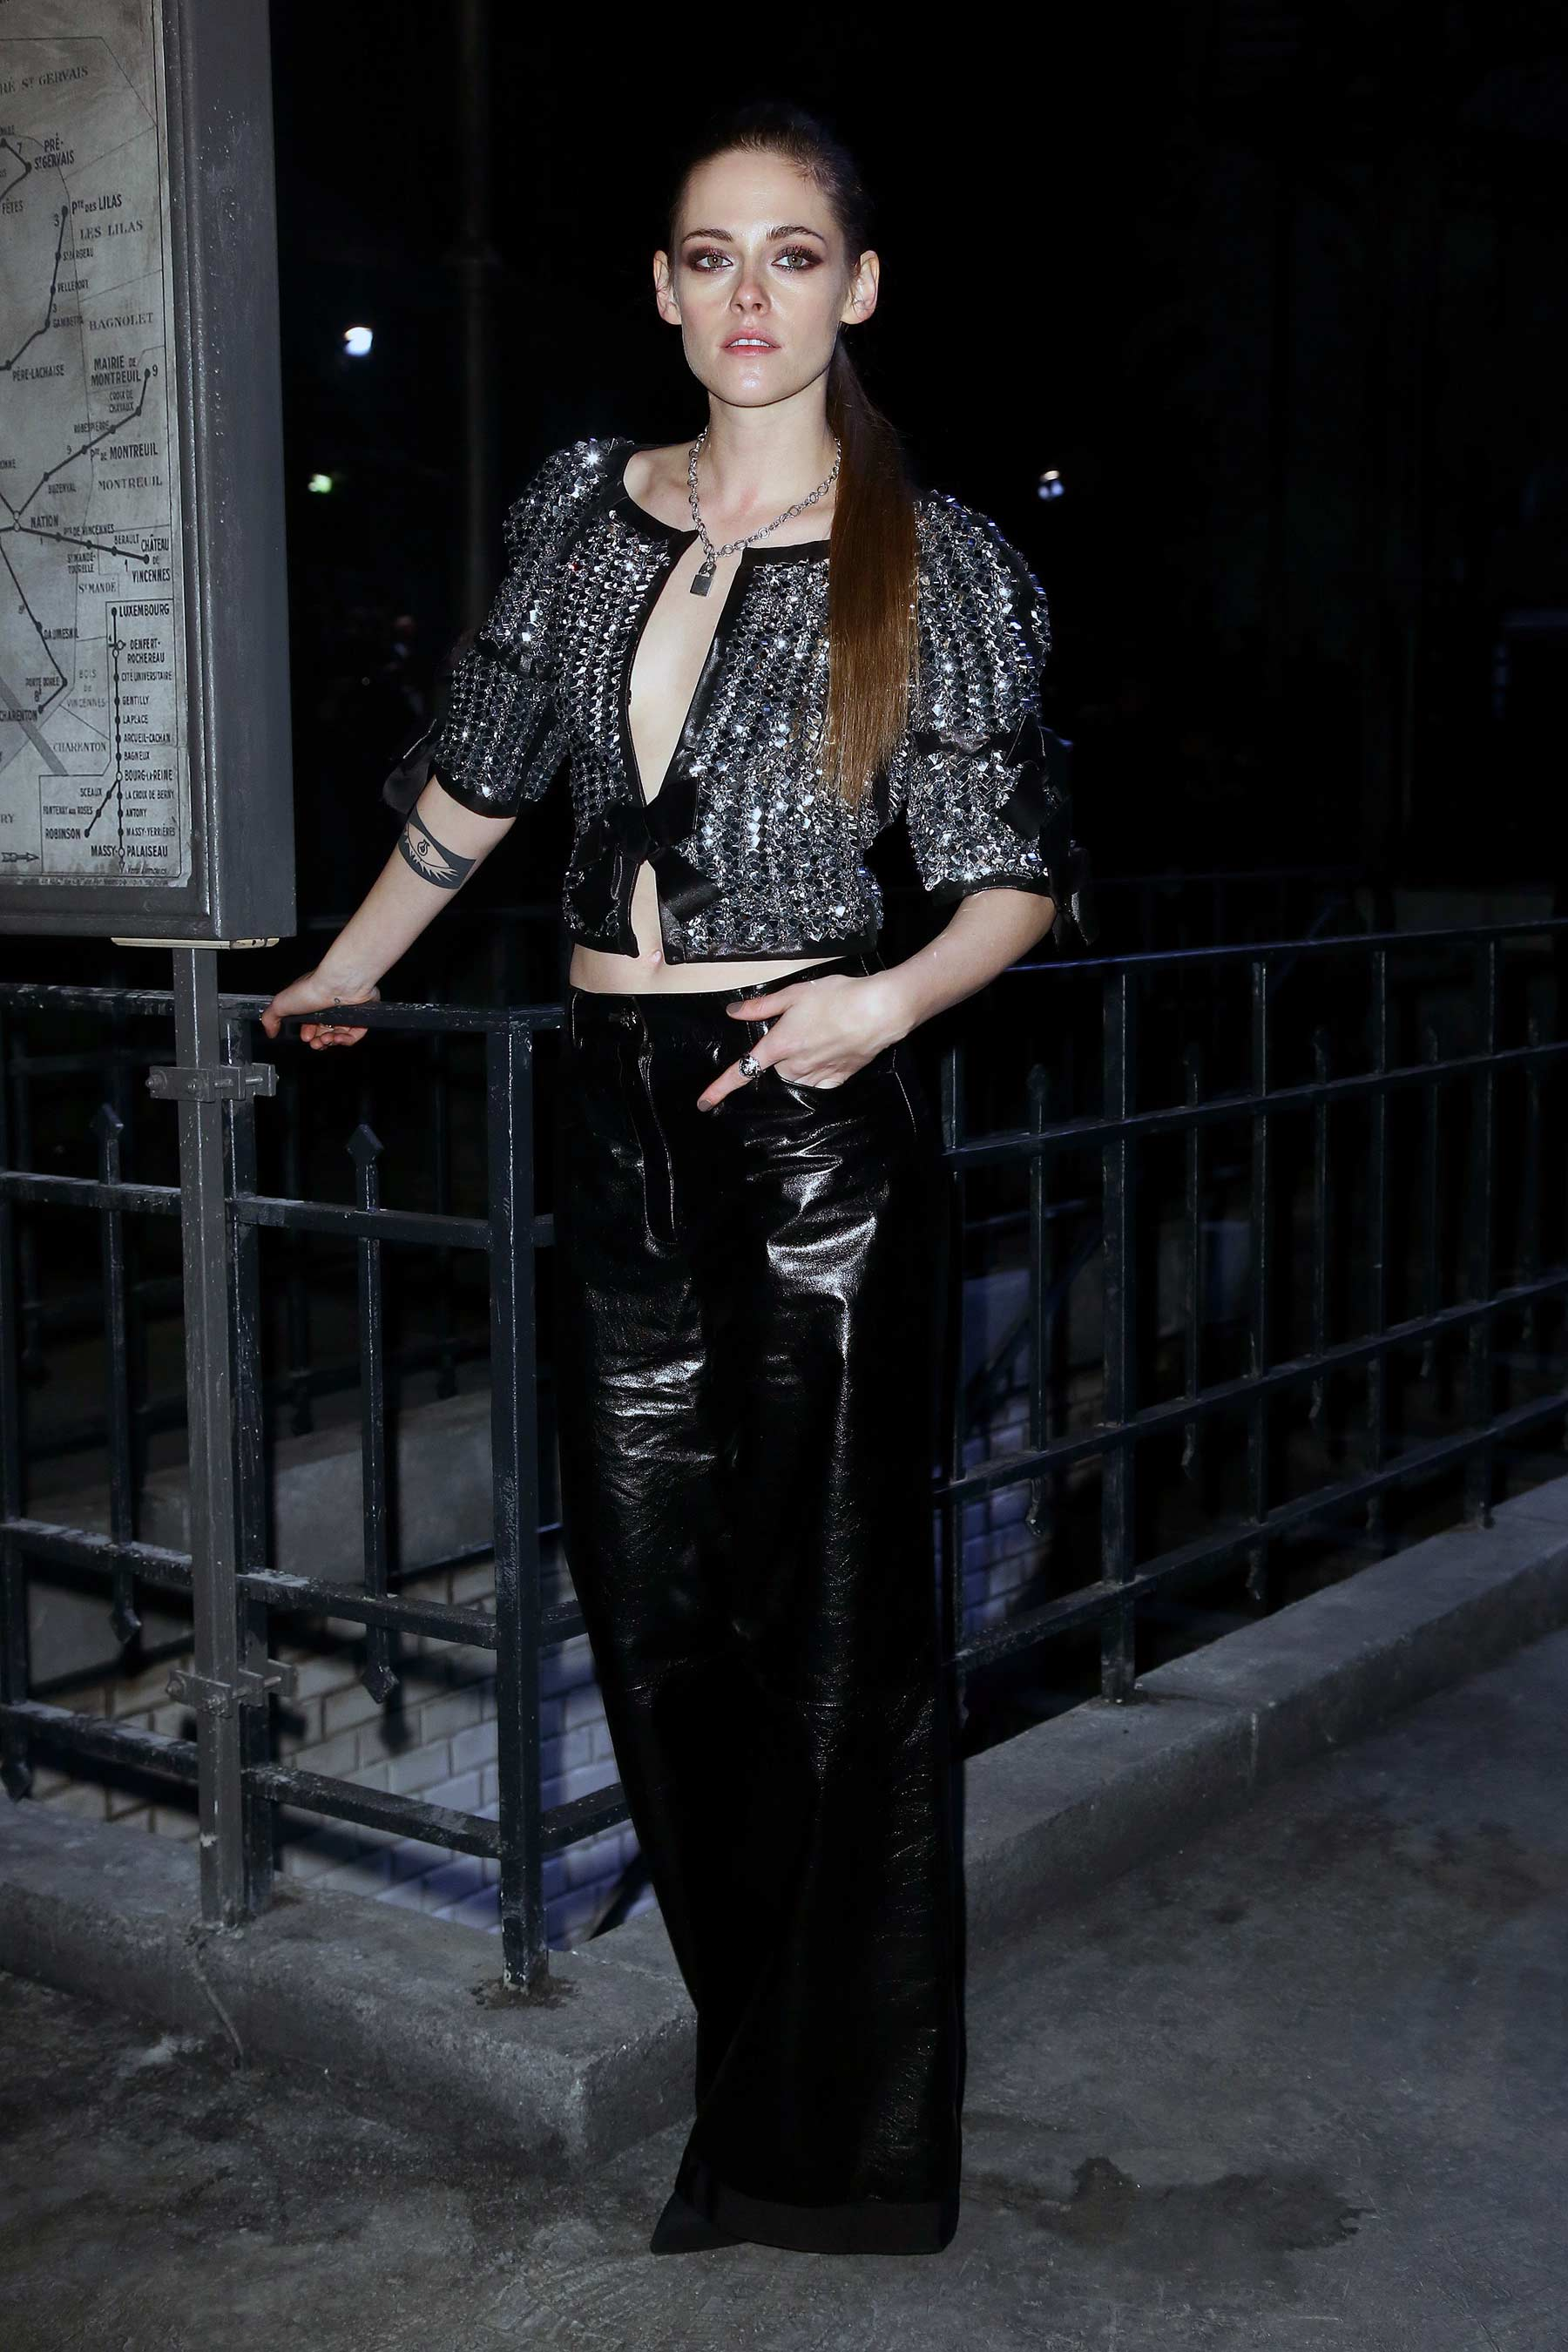 Kristen Stewart attends the Chanel Metiers d'Art 2015/16 Fashion Show